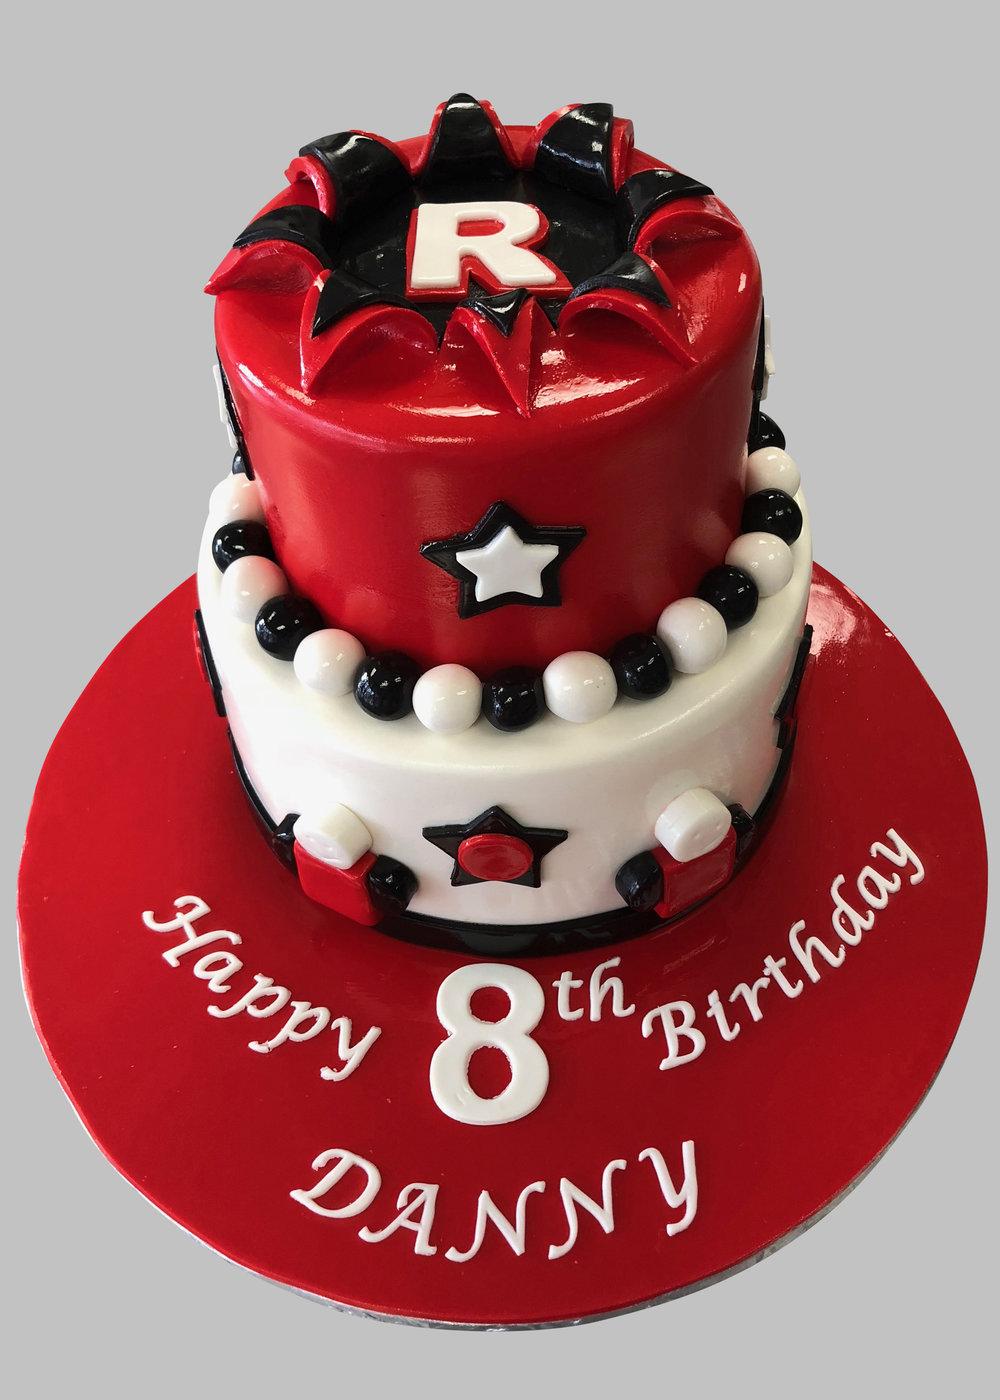 Best Birthday Cake NJ